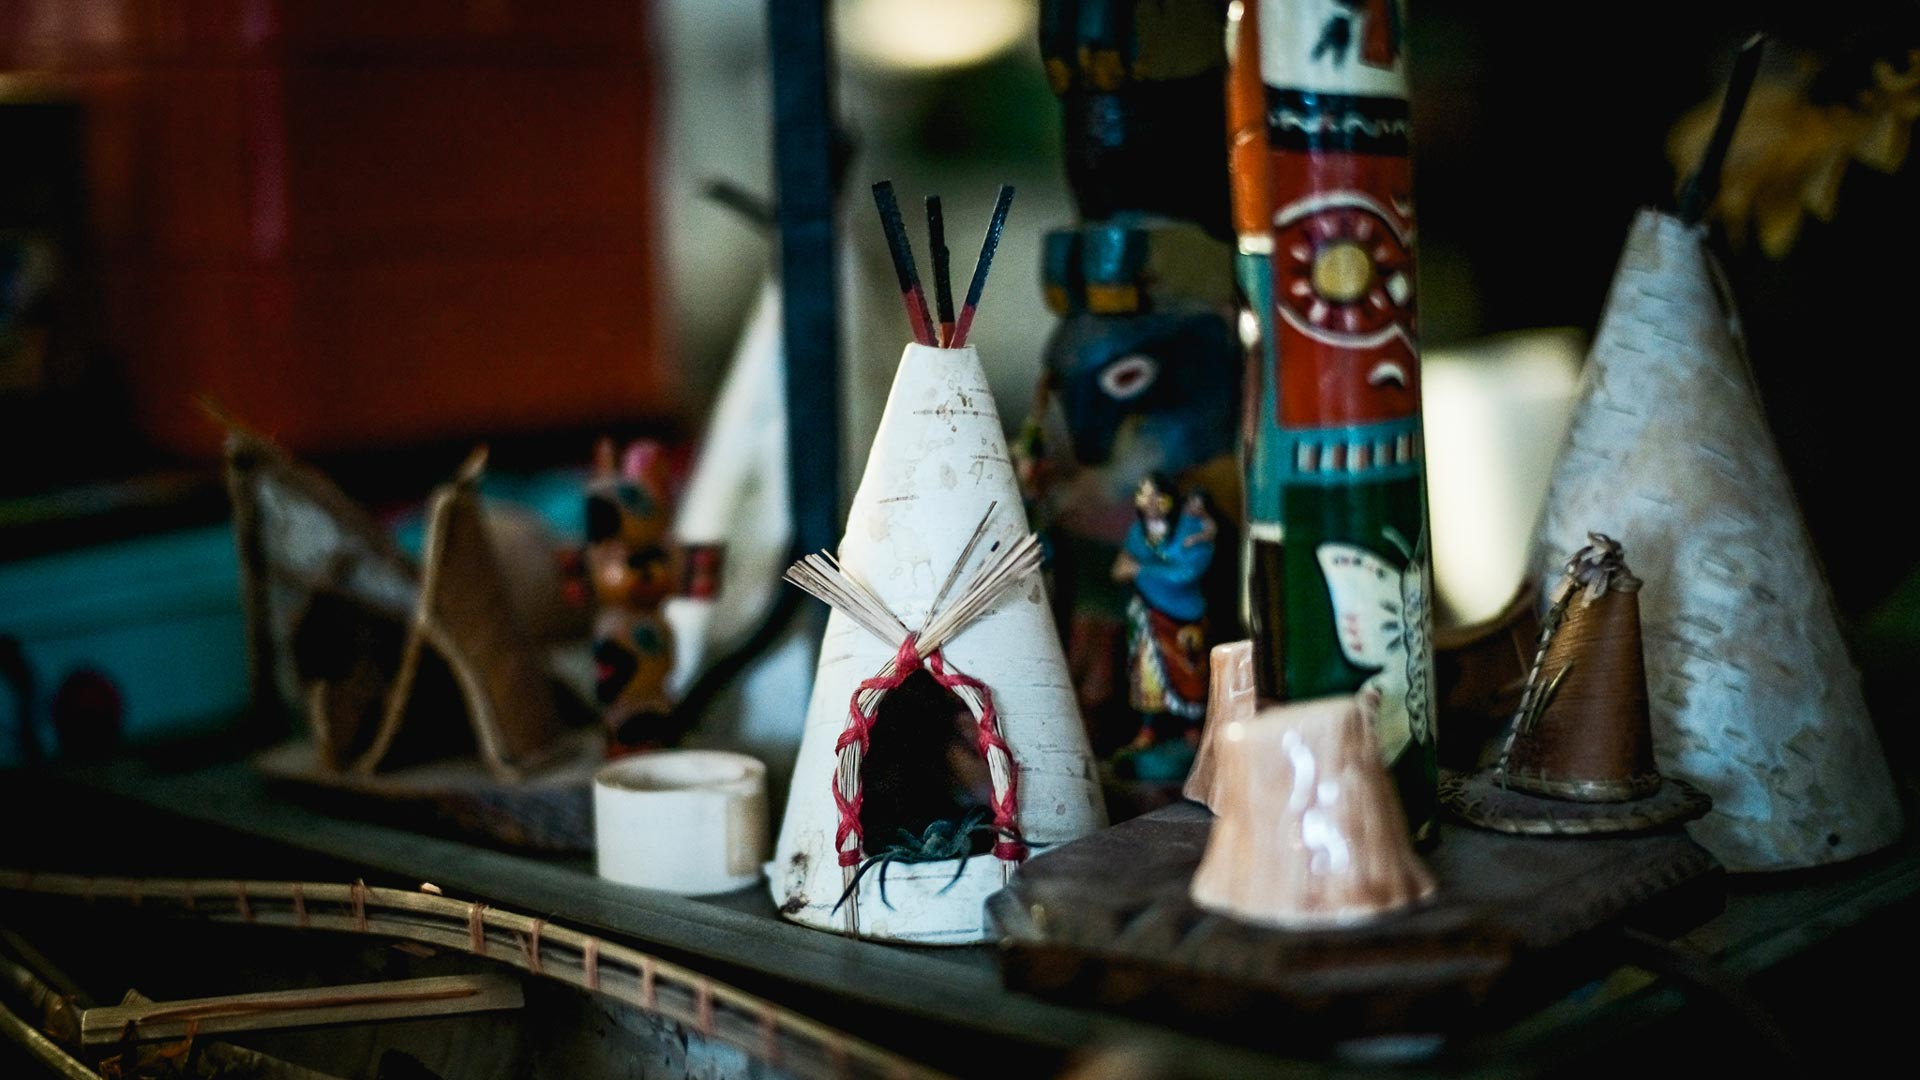 dorothy globus studio miniature native american vilage